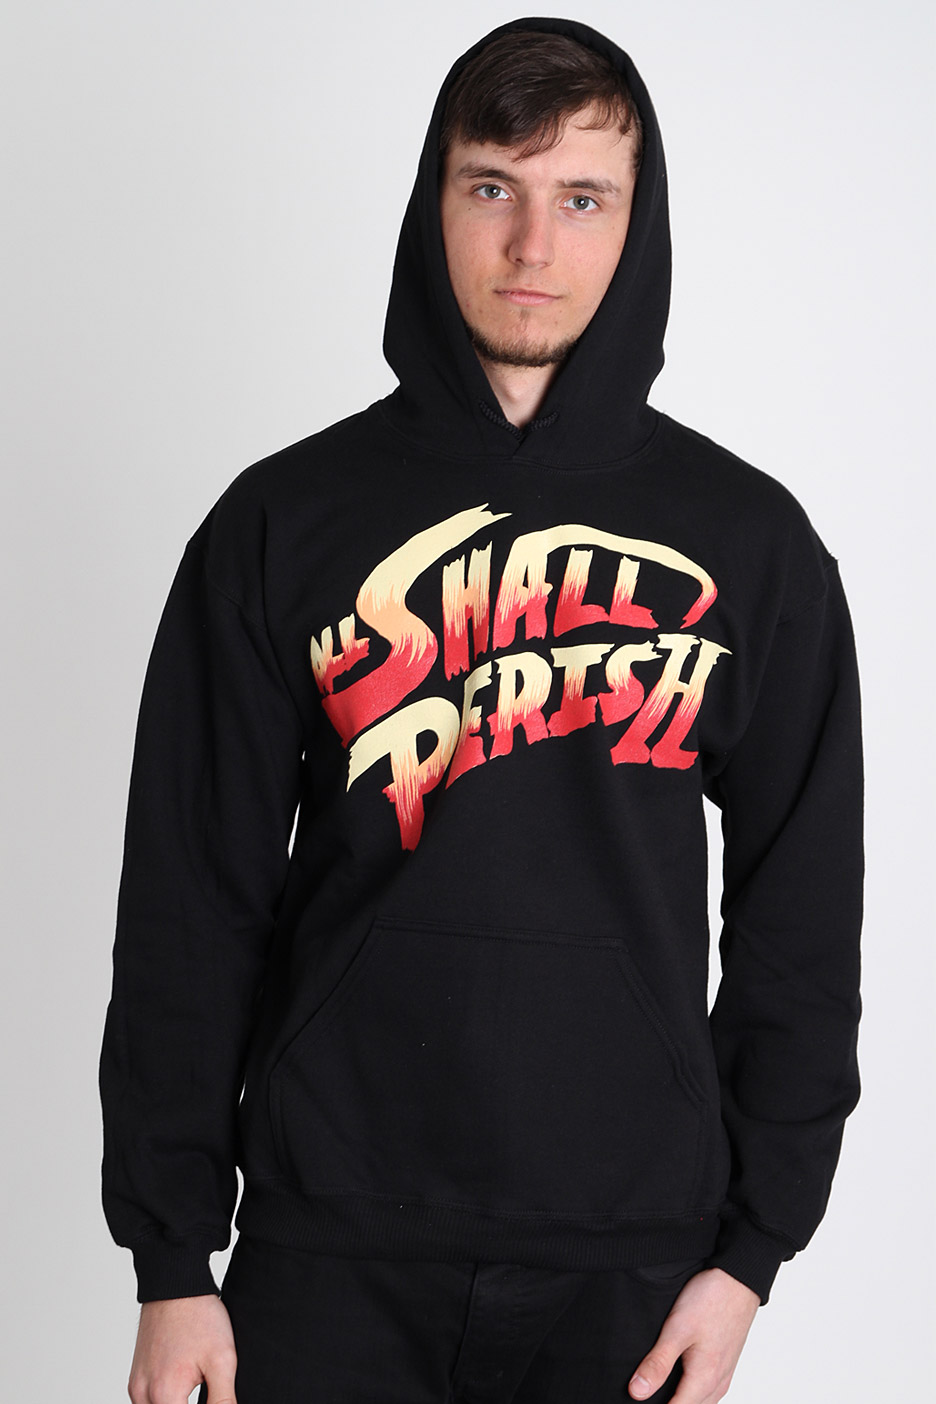 All shall perish hoodie